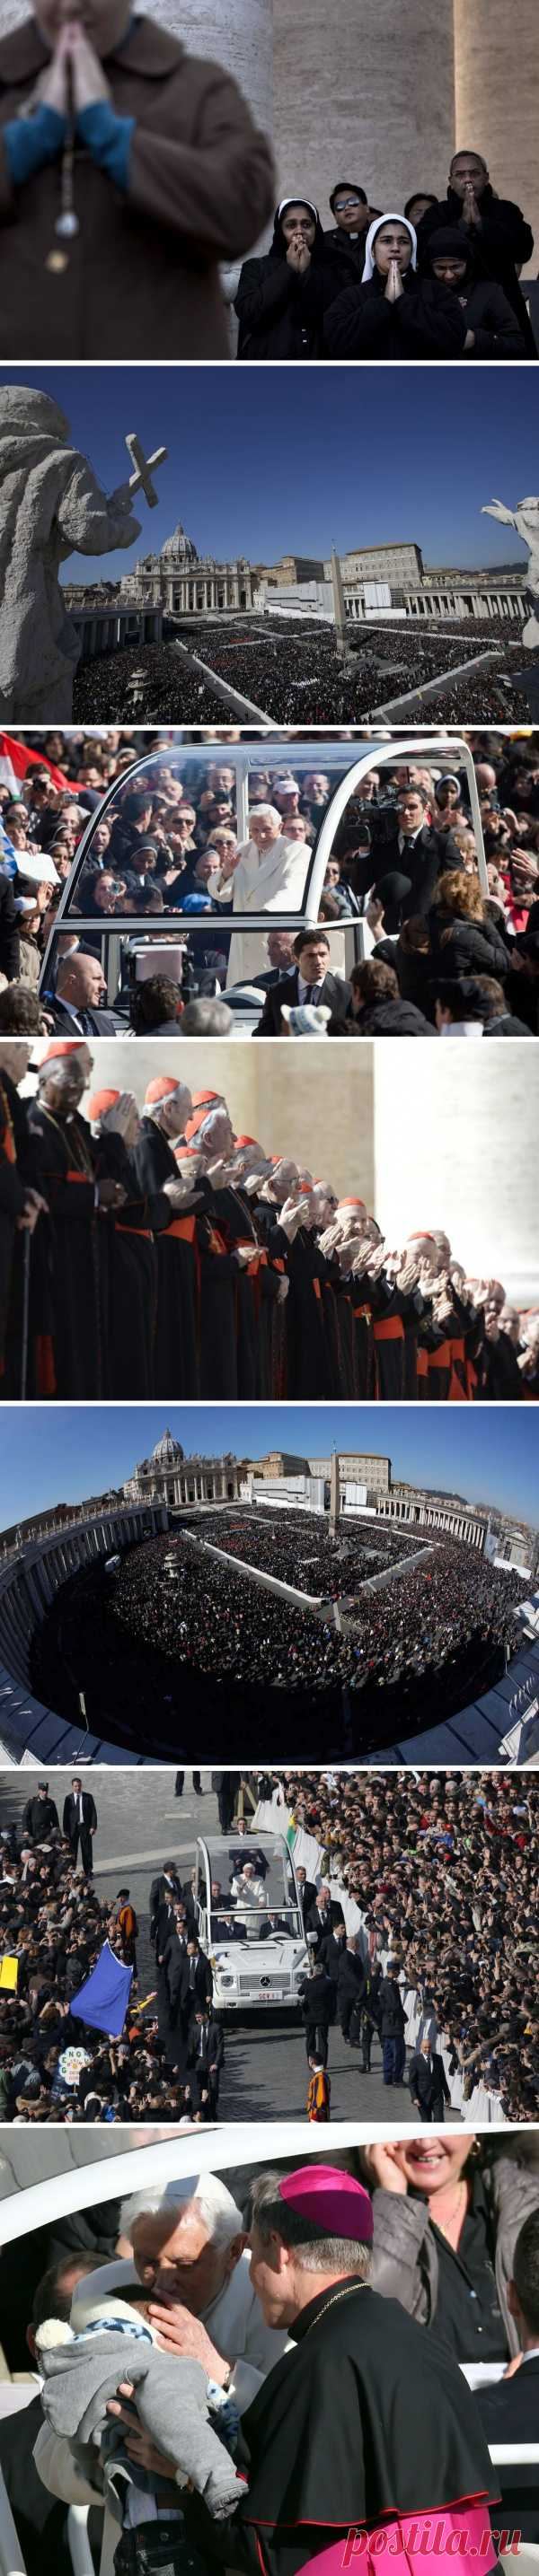 Последняя аудиенция Папы Бенедикта XVI, Ватикан